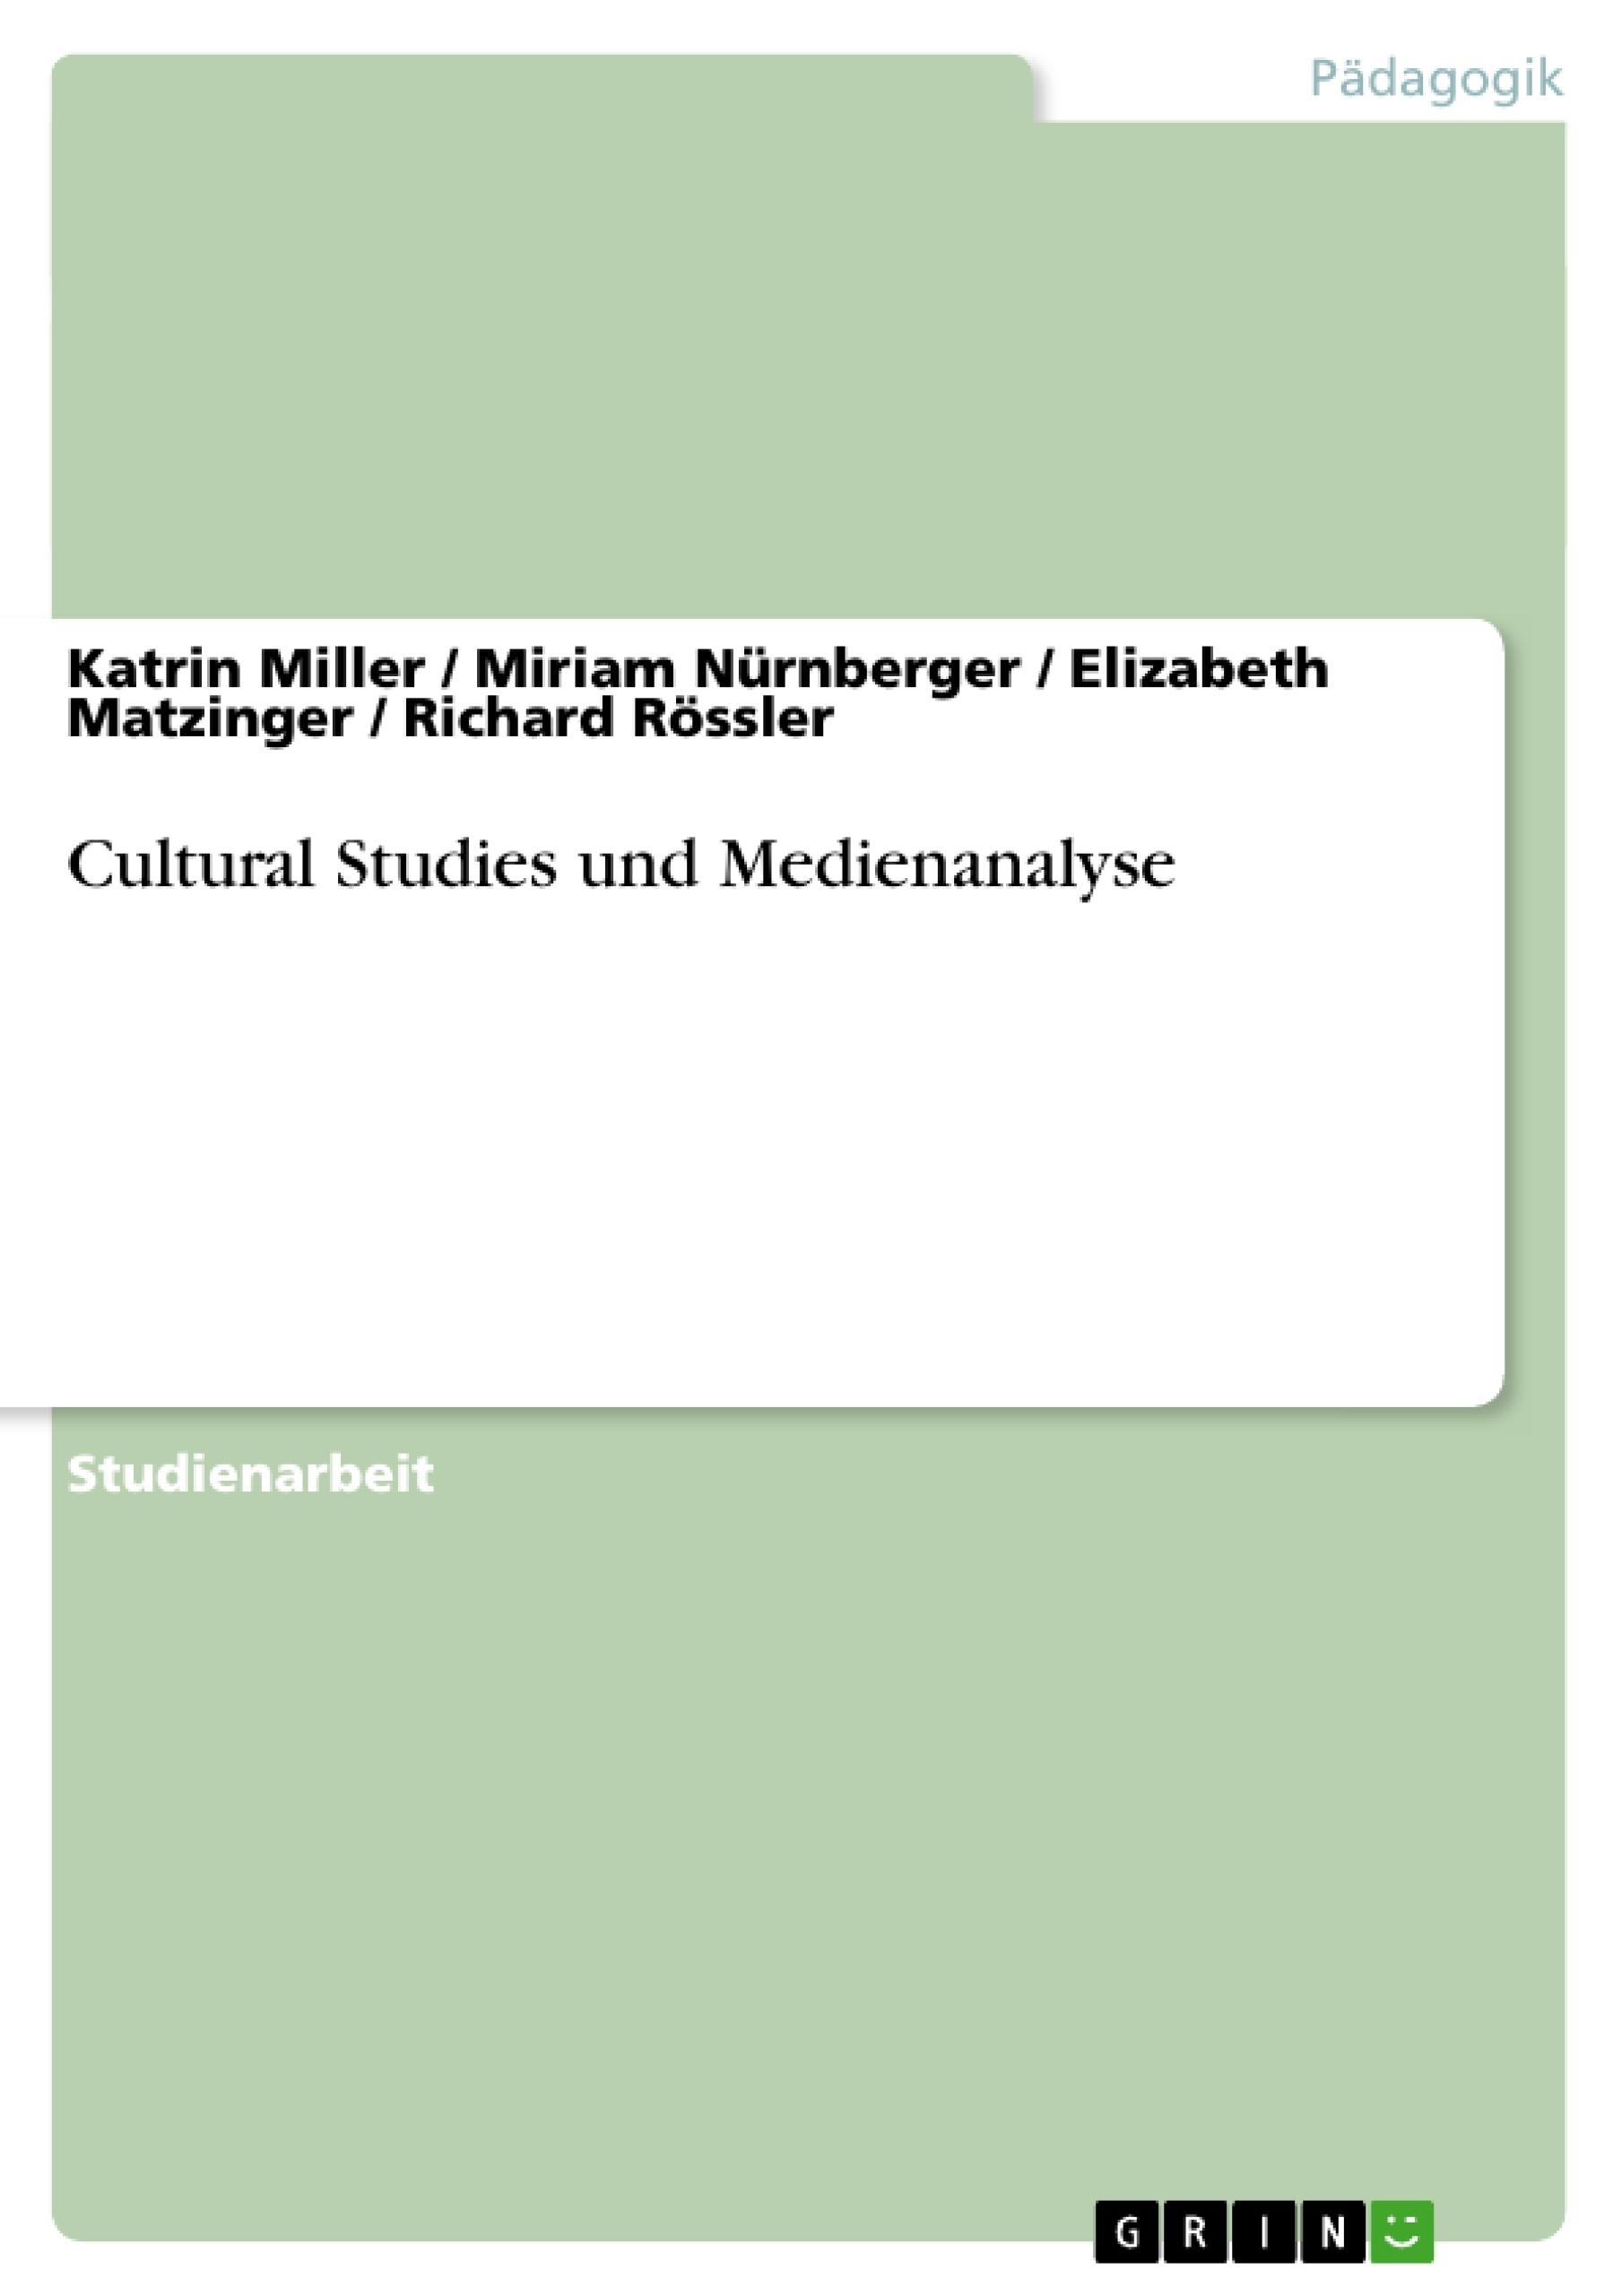 Titel: Cultural Studies und Medienanalyse